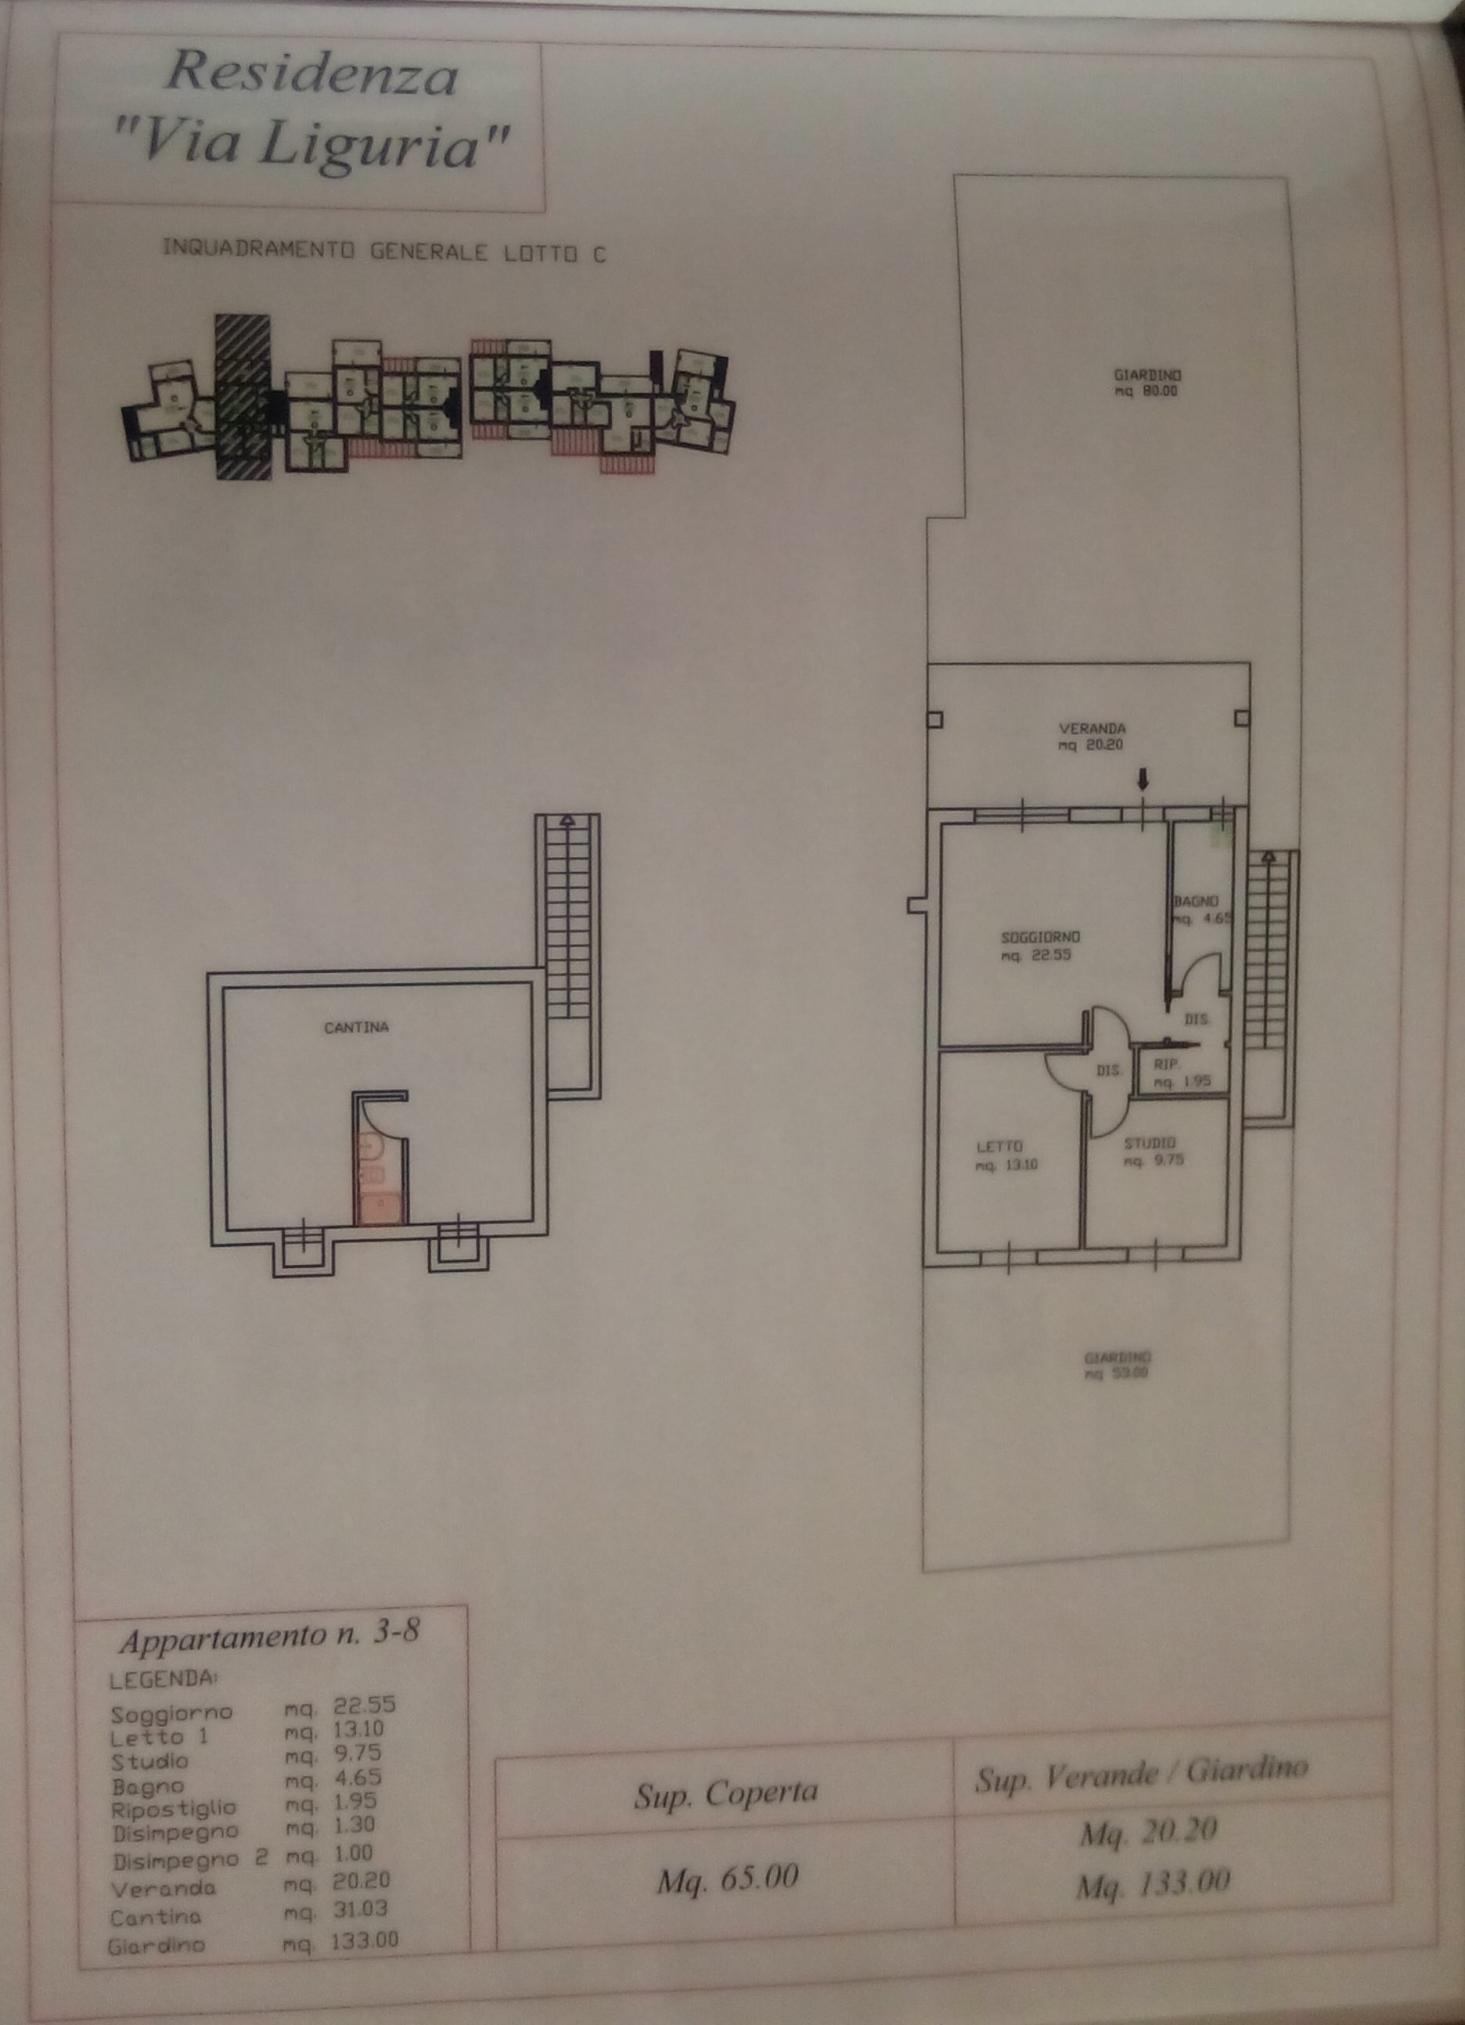 3 Bedroom Terraced House For Sale In Sardinia Sassari Valledoria Electrical Wiring Diagram Basement Italy